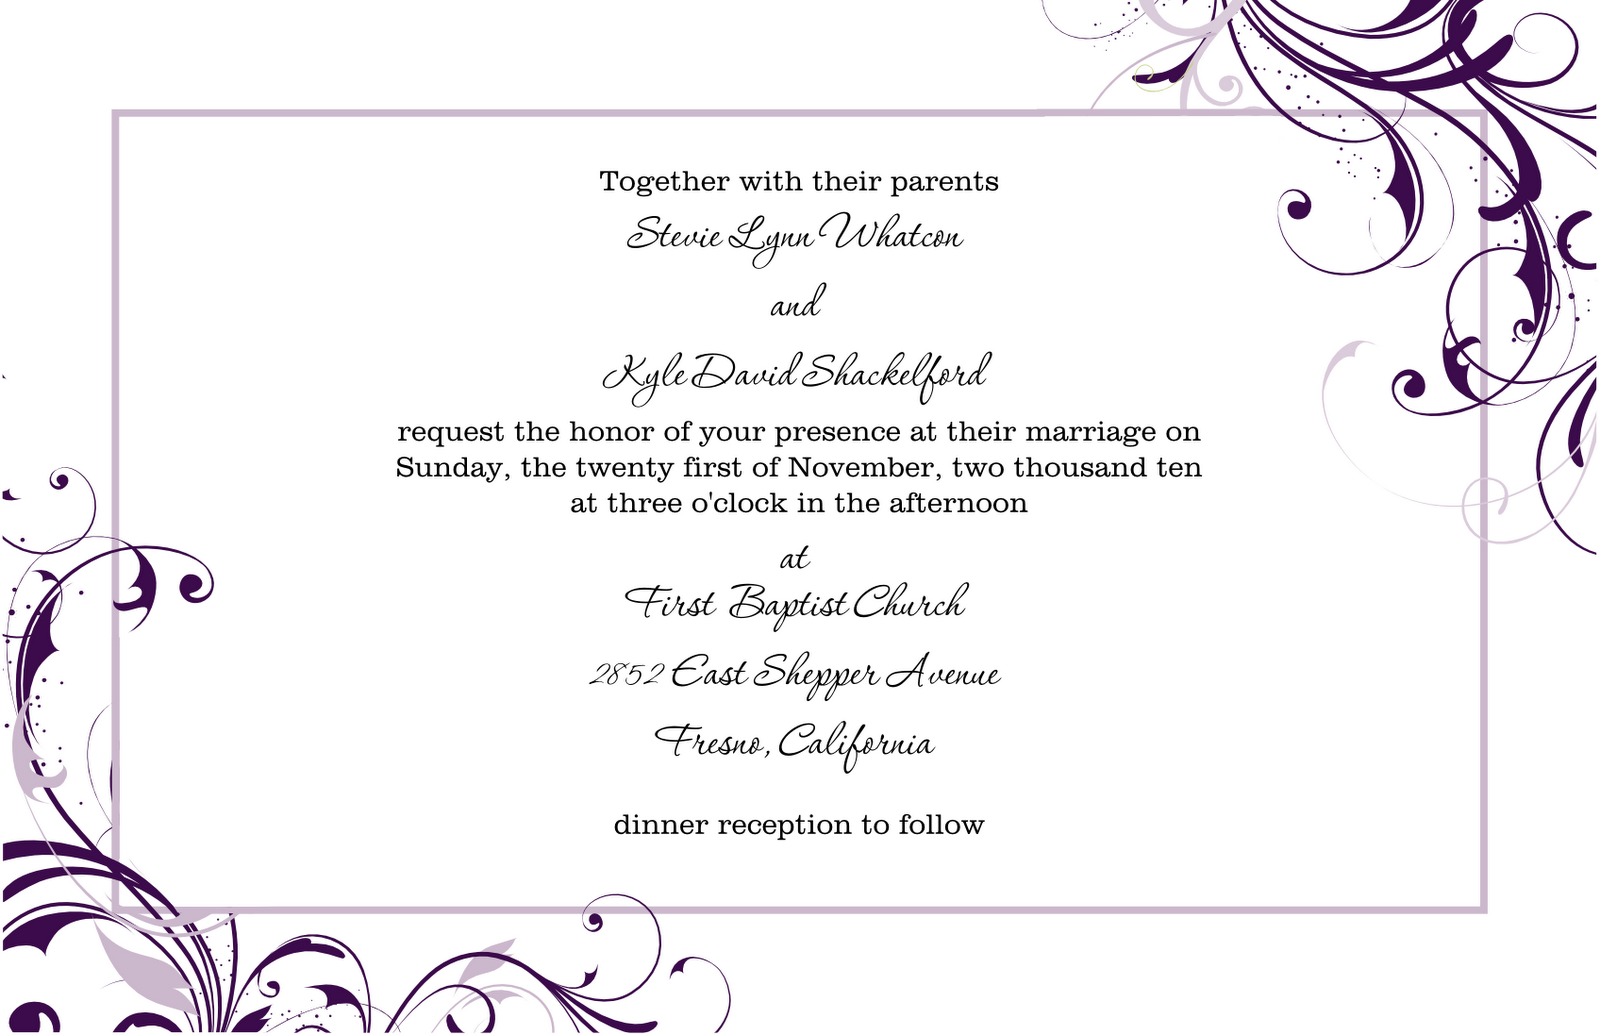 Wedding invitation suite for roberta